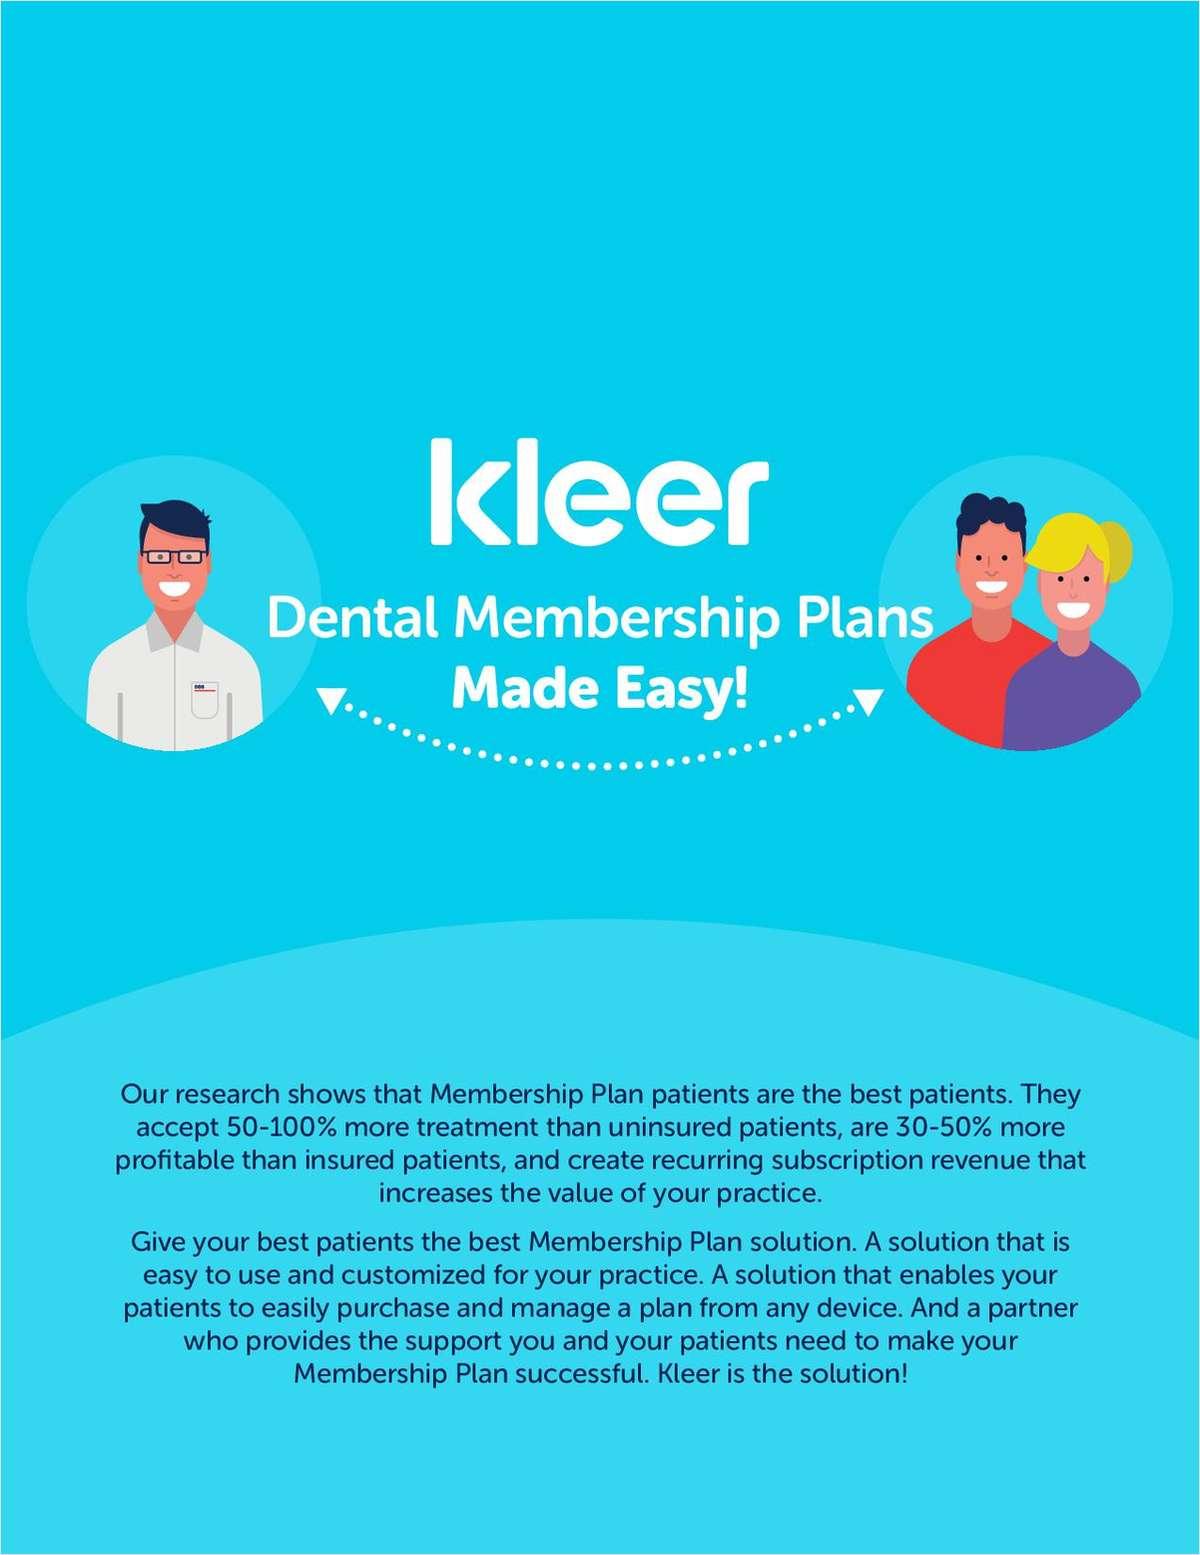 Dental Membership Plans Made Easy!